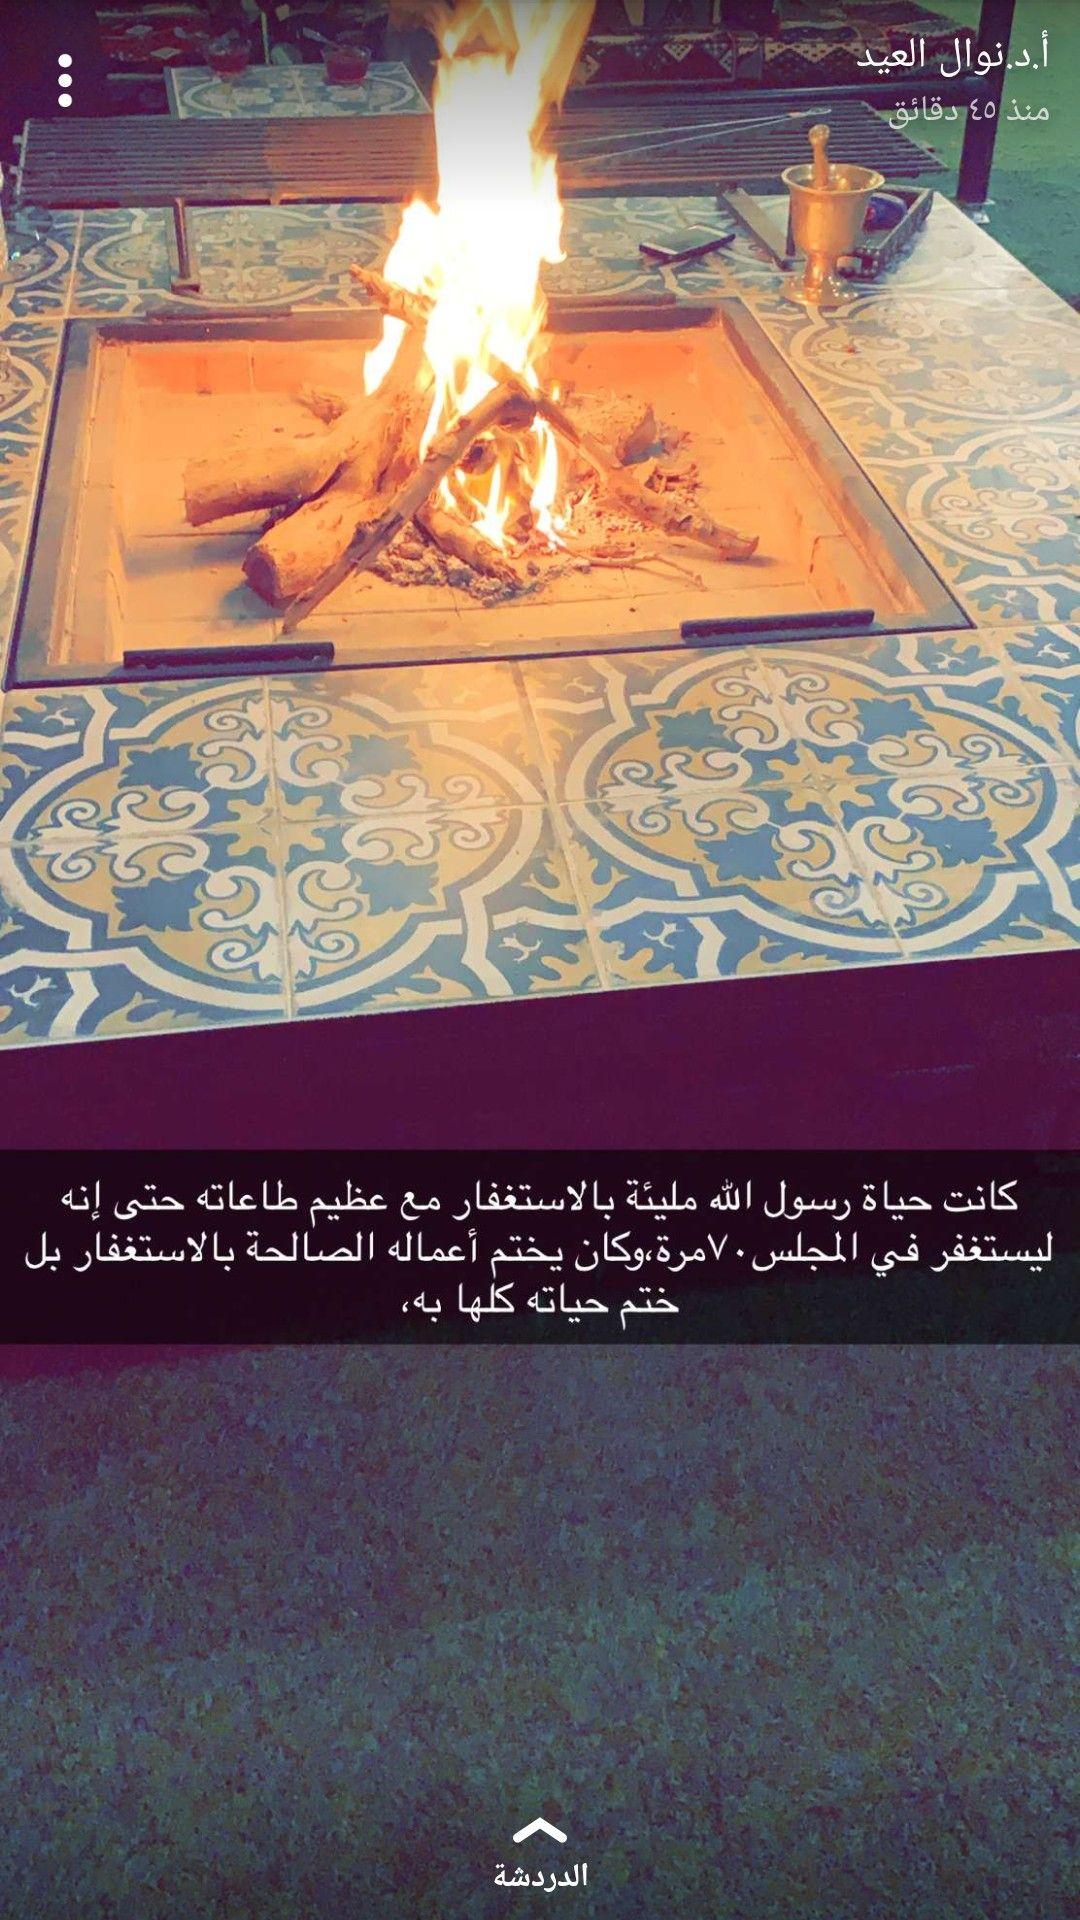 Pin By Raneem On دعاء دين اسلام اذكار Dining Table Home Decor Decor